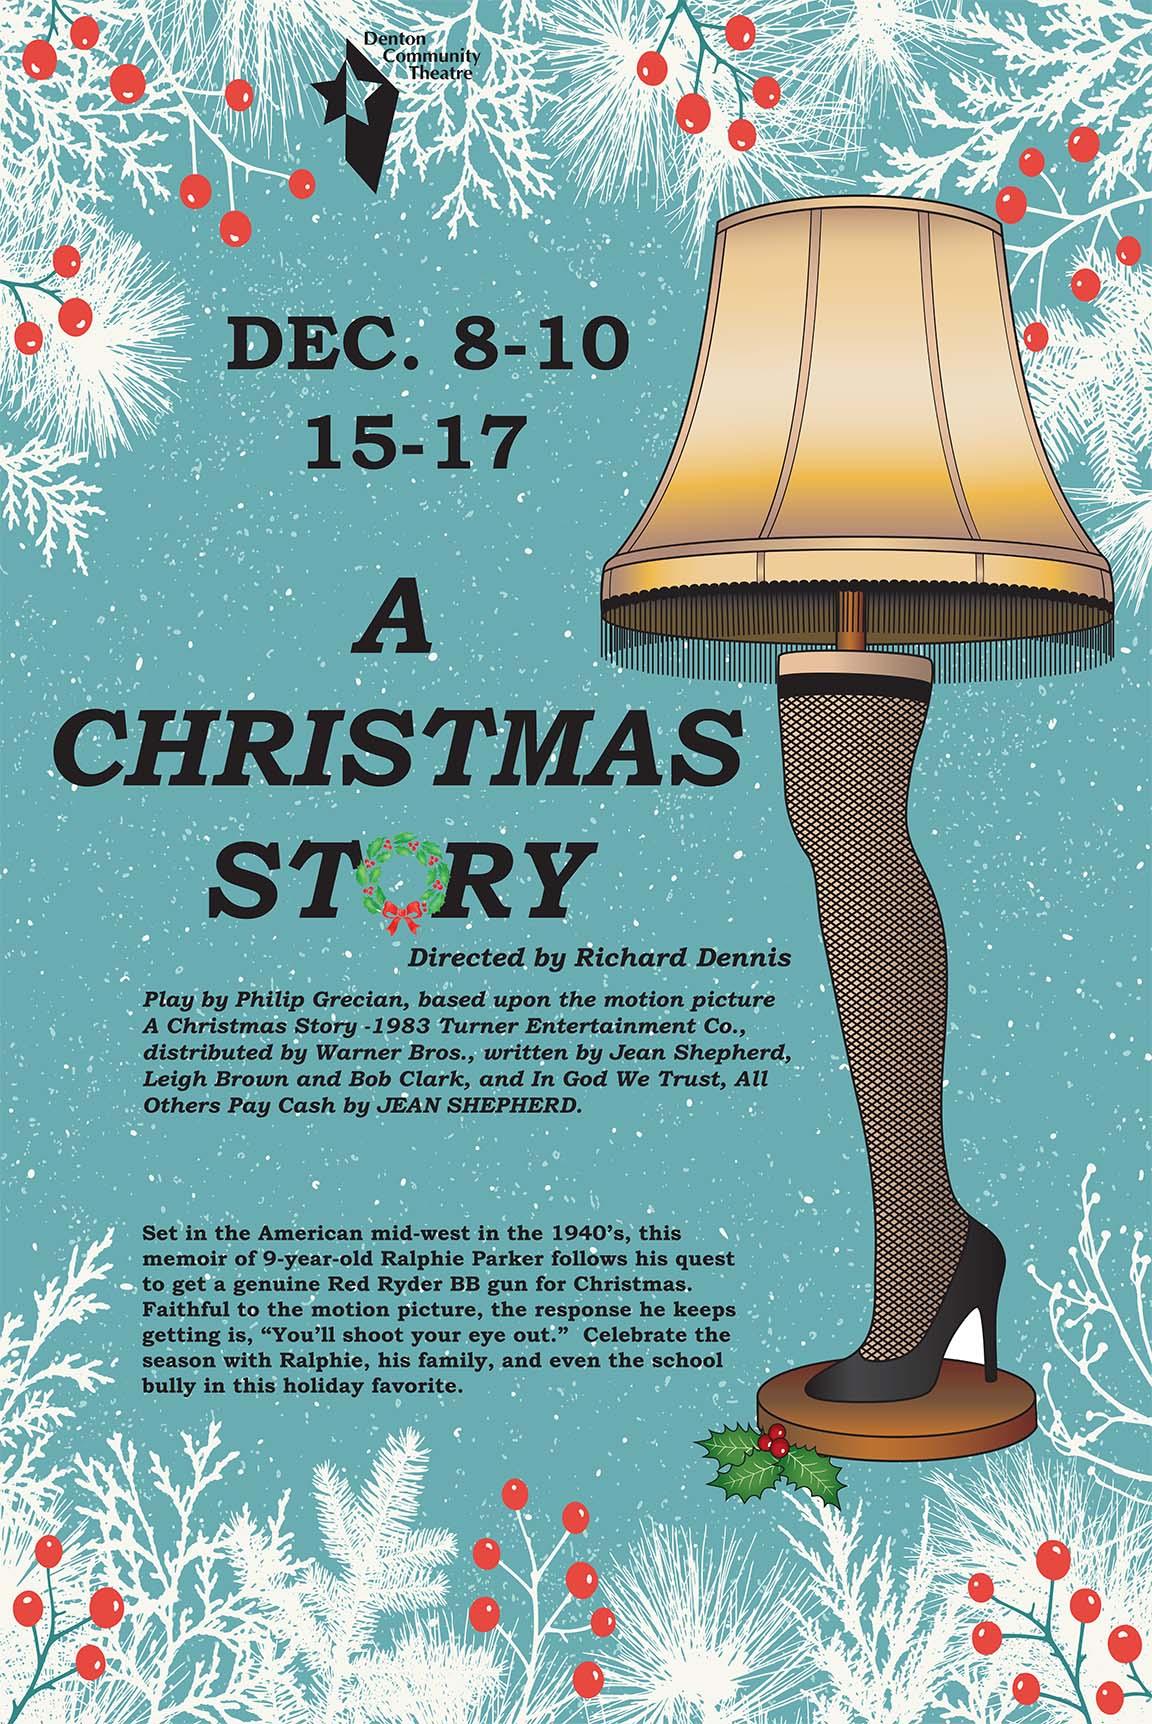 Christmas-Story-lo-res-small.jpg